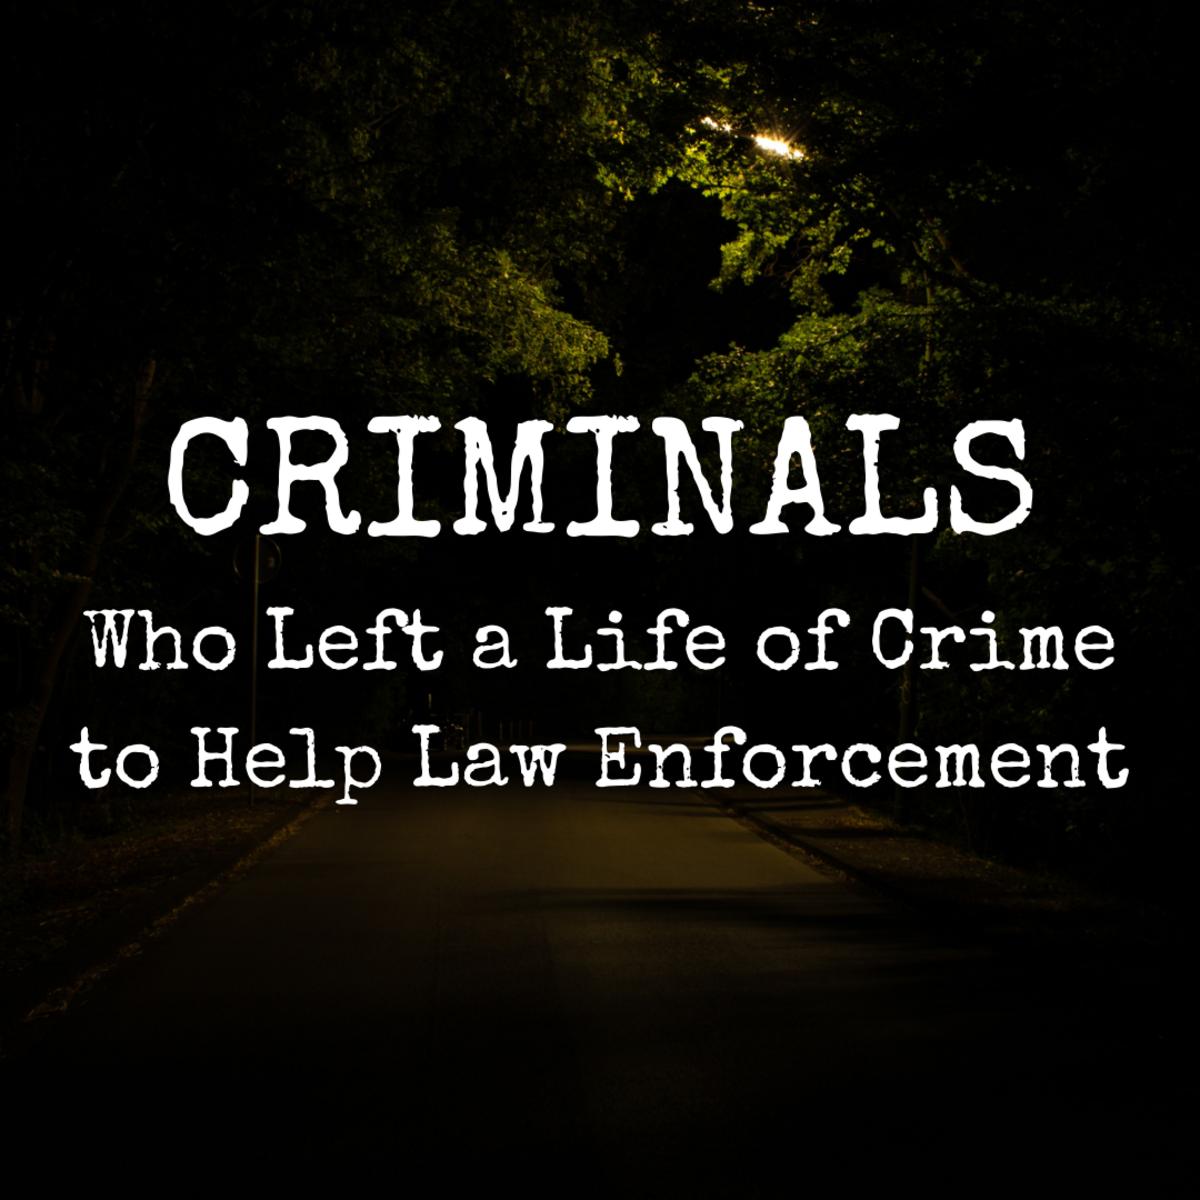 Five Criminals Who Helped Catch Other Criminals